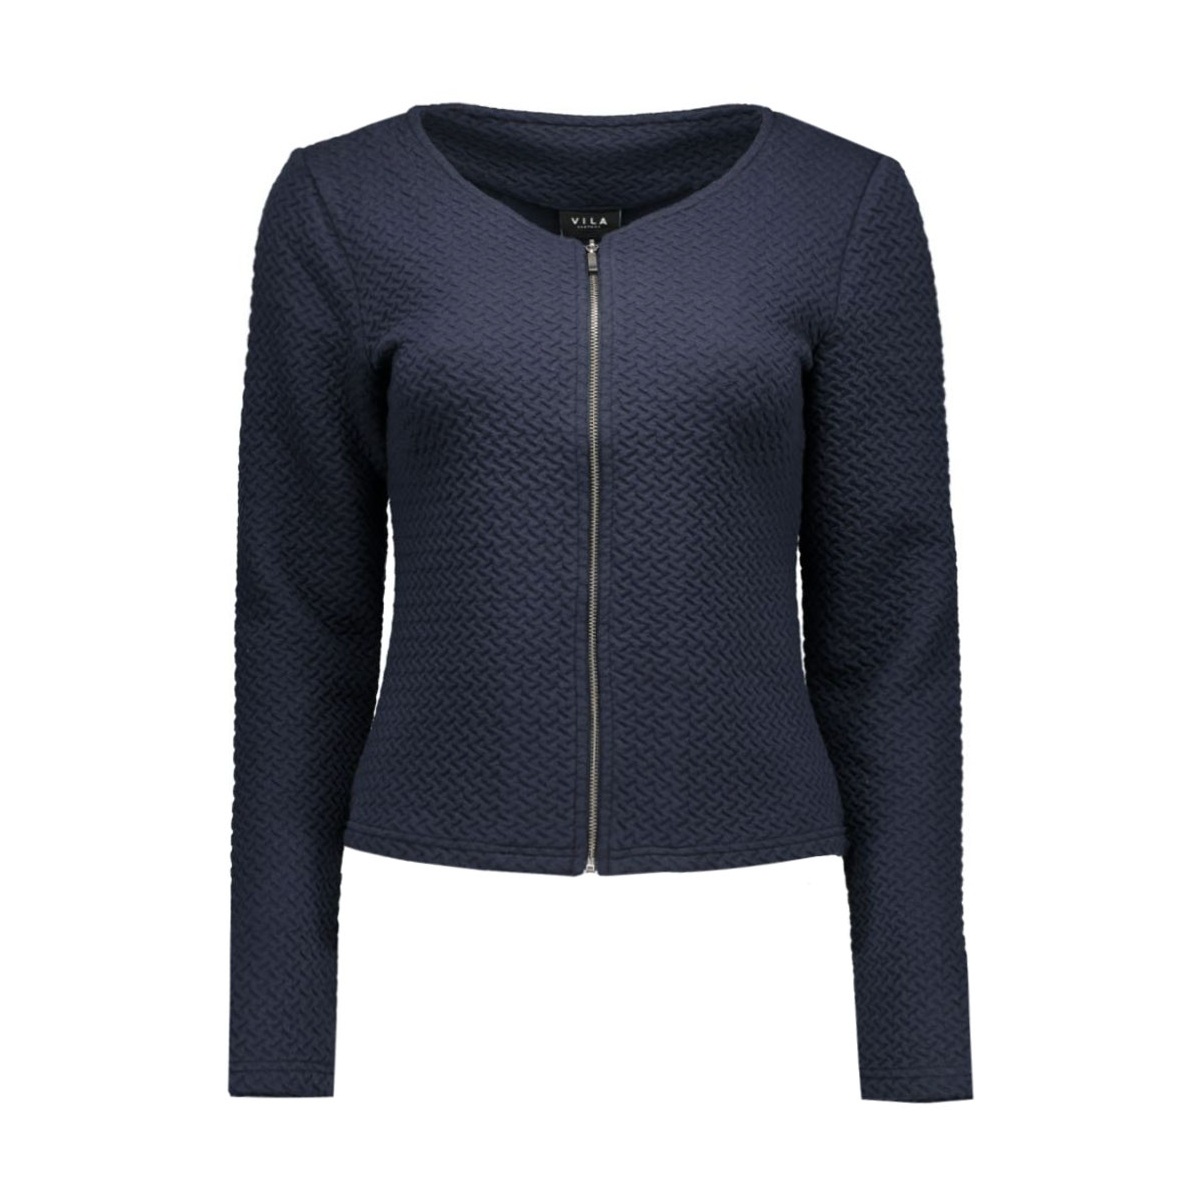 vinaja new short jacket-noos 14032657 vila blazer total eclipse